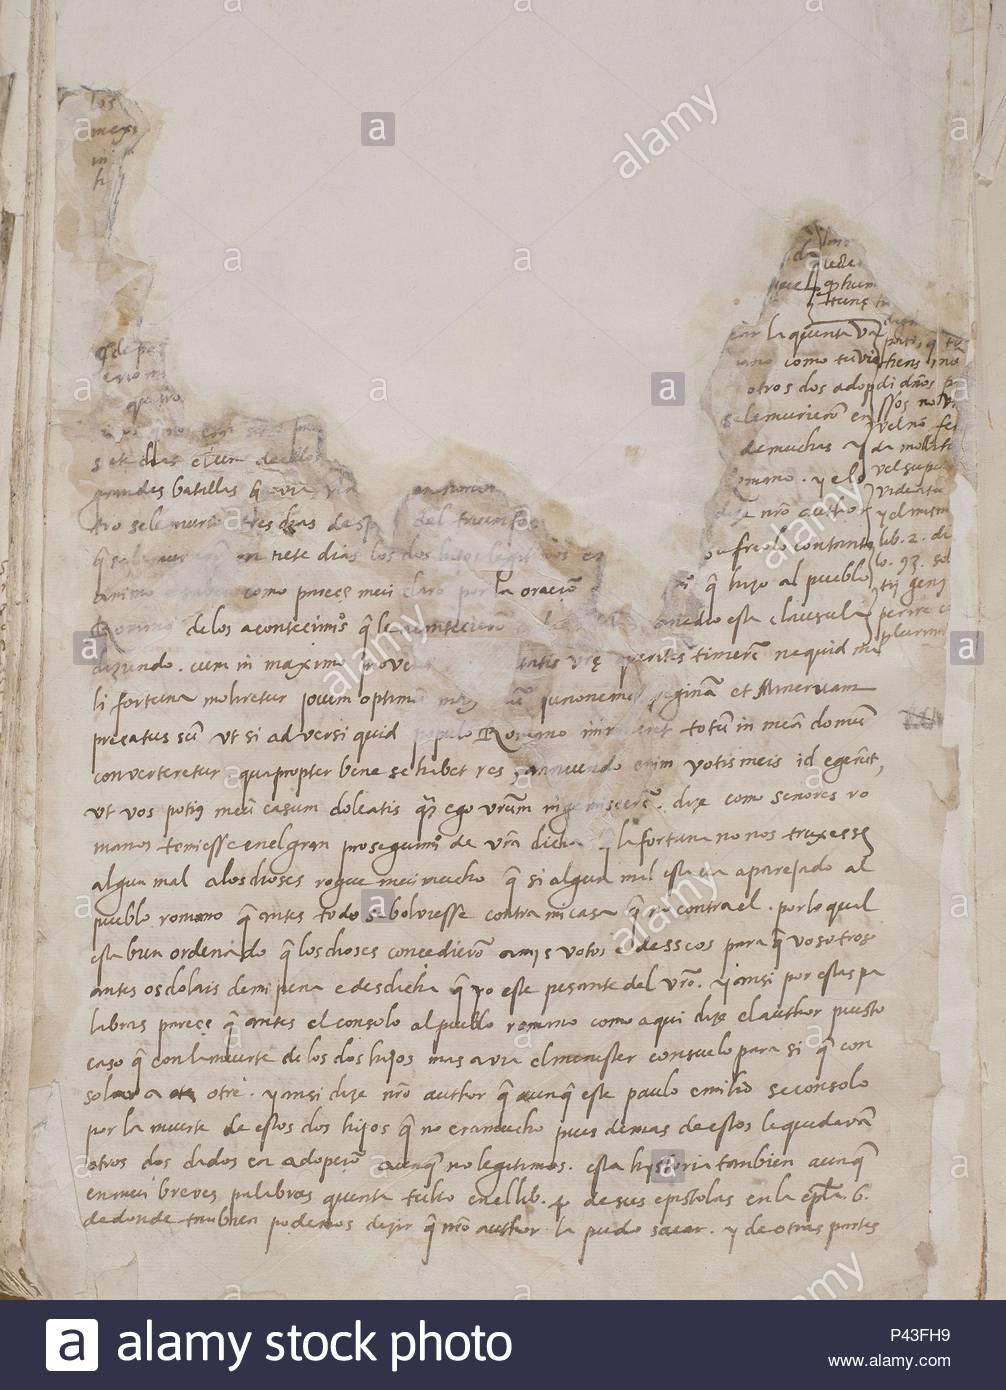 ULTIMA PAGINA DE LA CELESTINA. Author: Fernando de Rojas (c. 1470-1541). Location: BIBLIOTECA NACIONAL-COLECCION, MADRID, SPAIN. - Stock Image